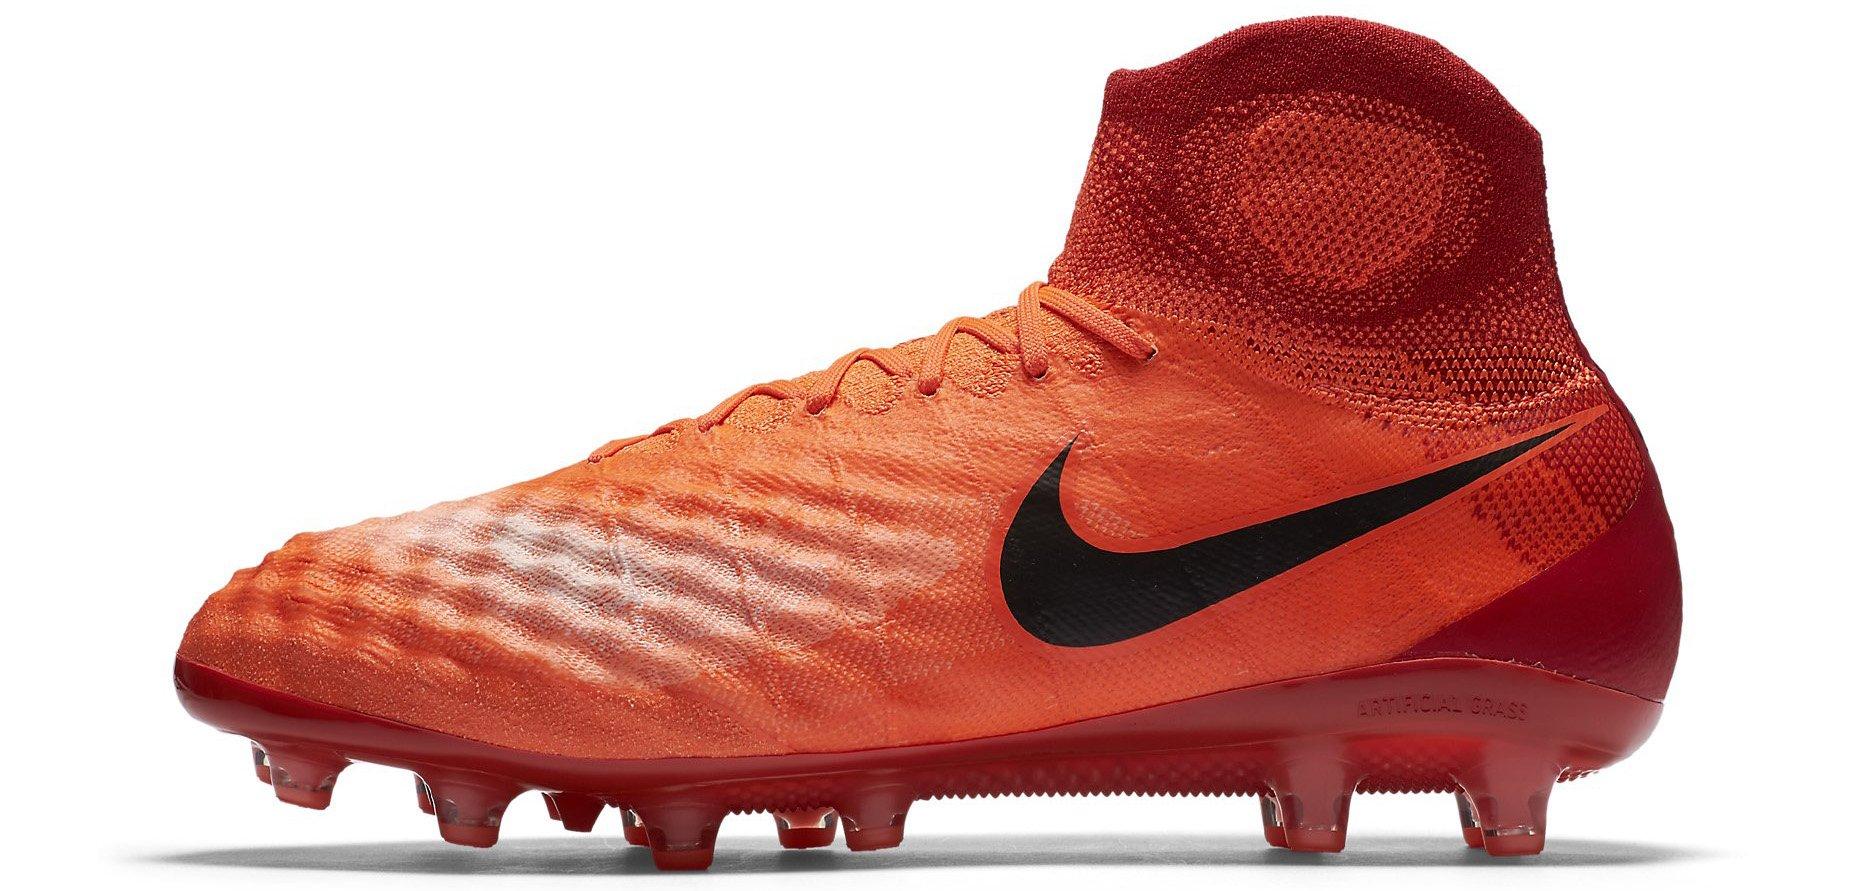 Nike Magista Obra II FG Sccer Cleats OrangeYellwBlack White Outlet